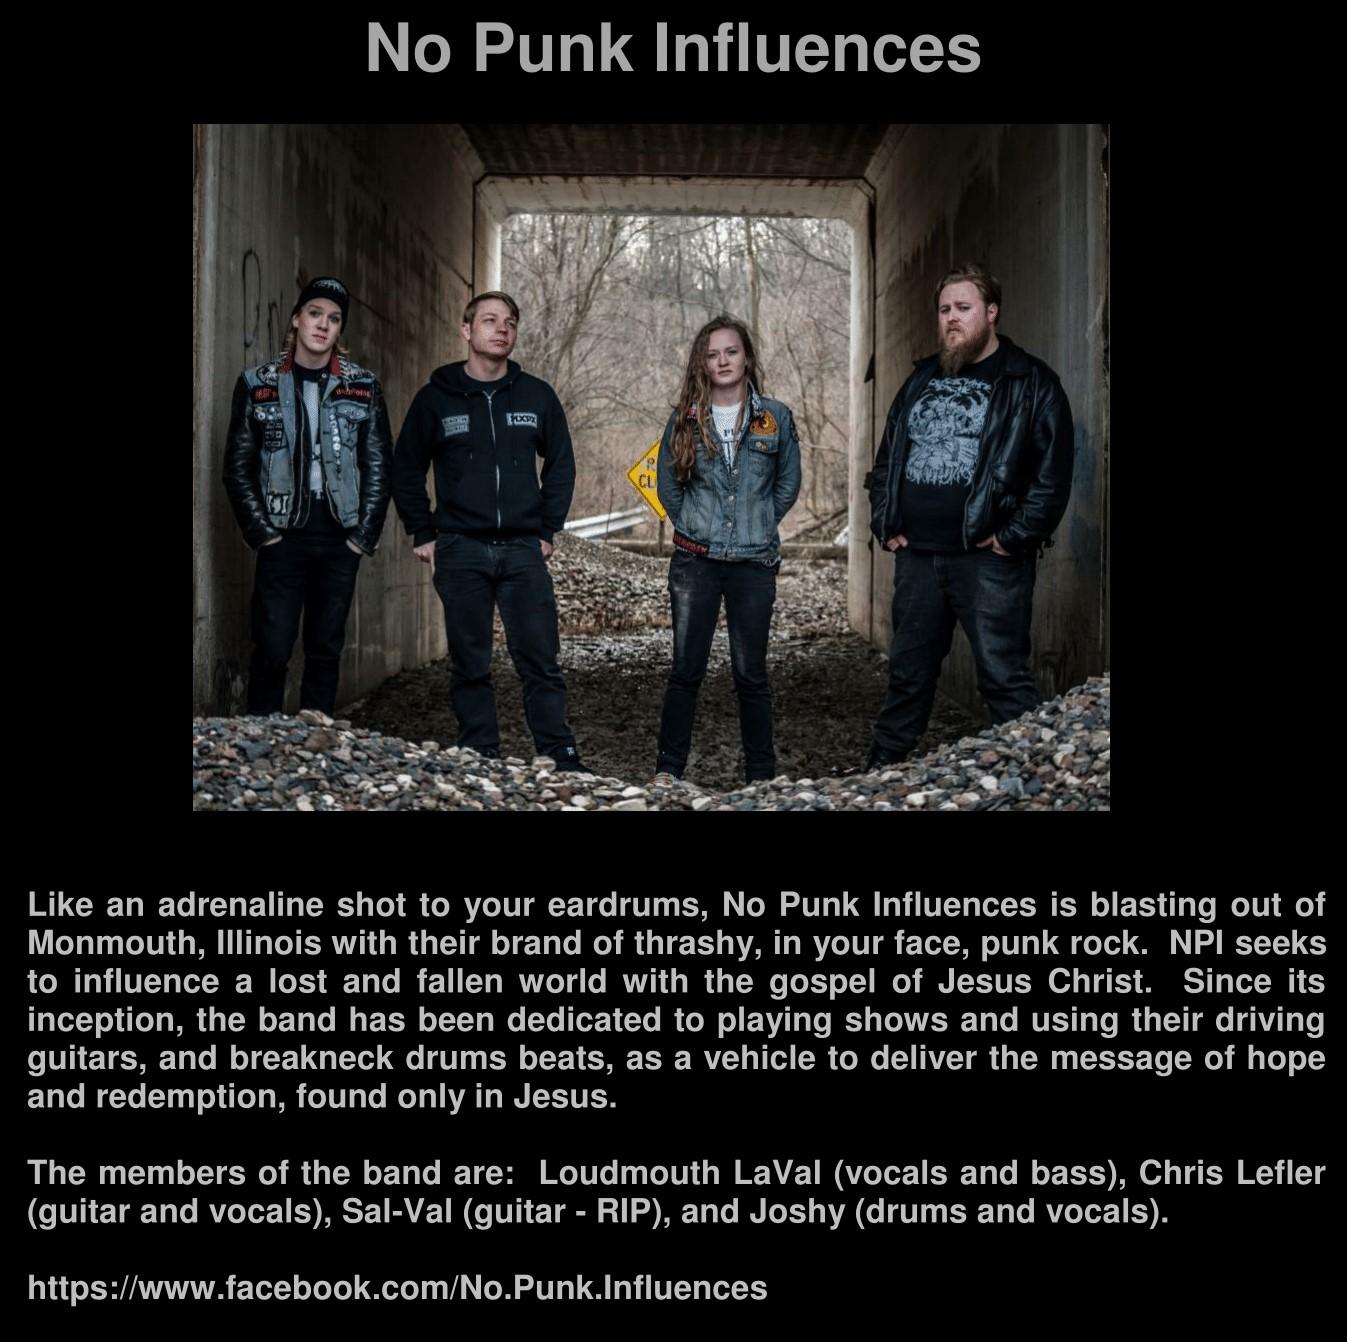 No Punk Influences 170104-1 crop.jpg